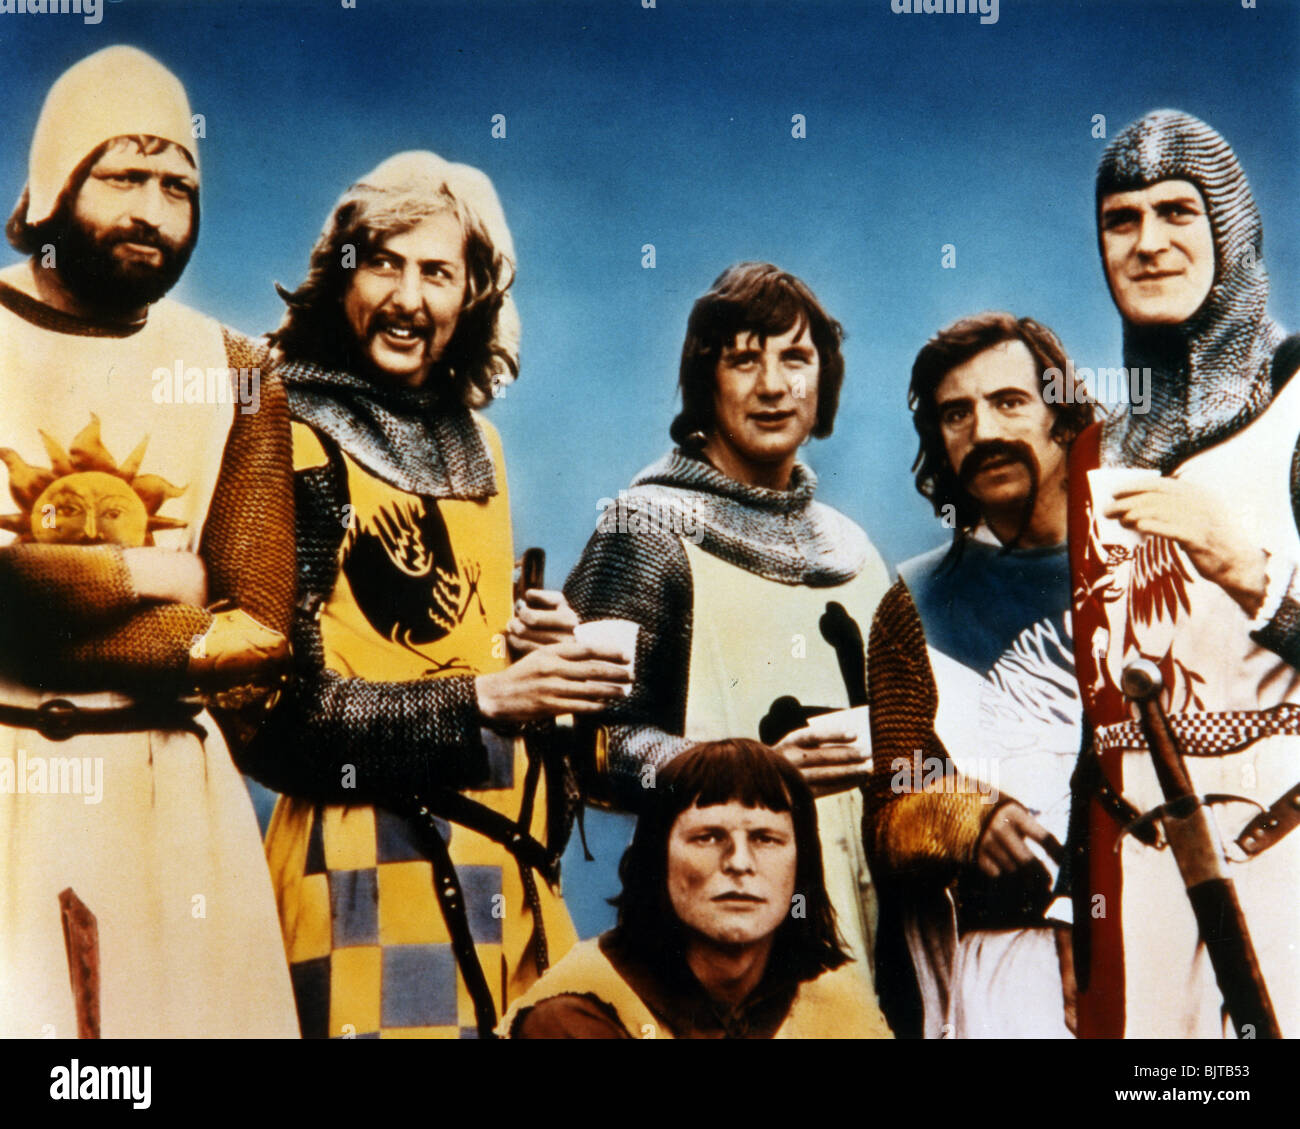 Monty Python The Royal Philharmonic Orchestra Goes To The Bathroom: Monty Python Stock Photos & Monty Python Stock Images